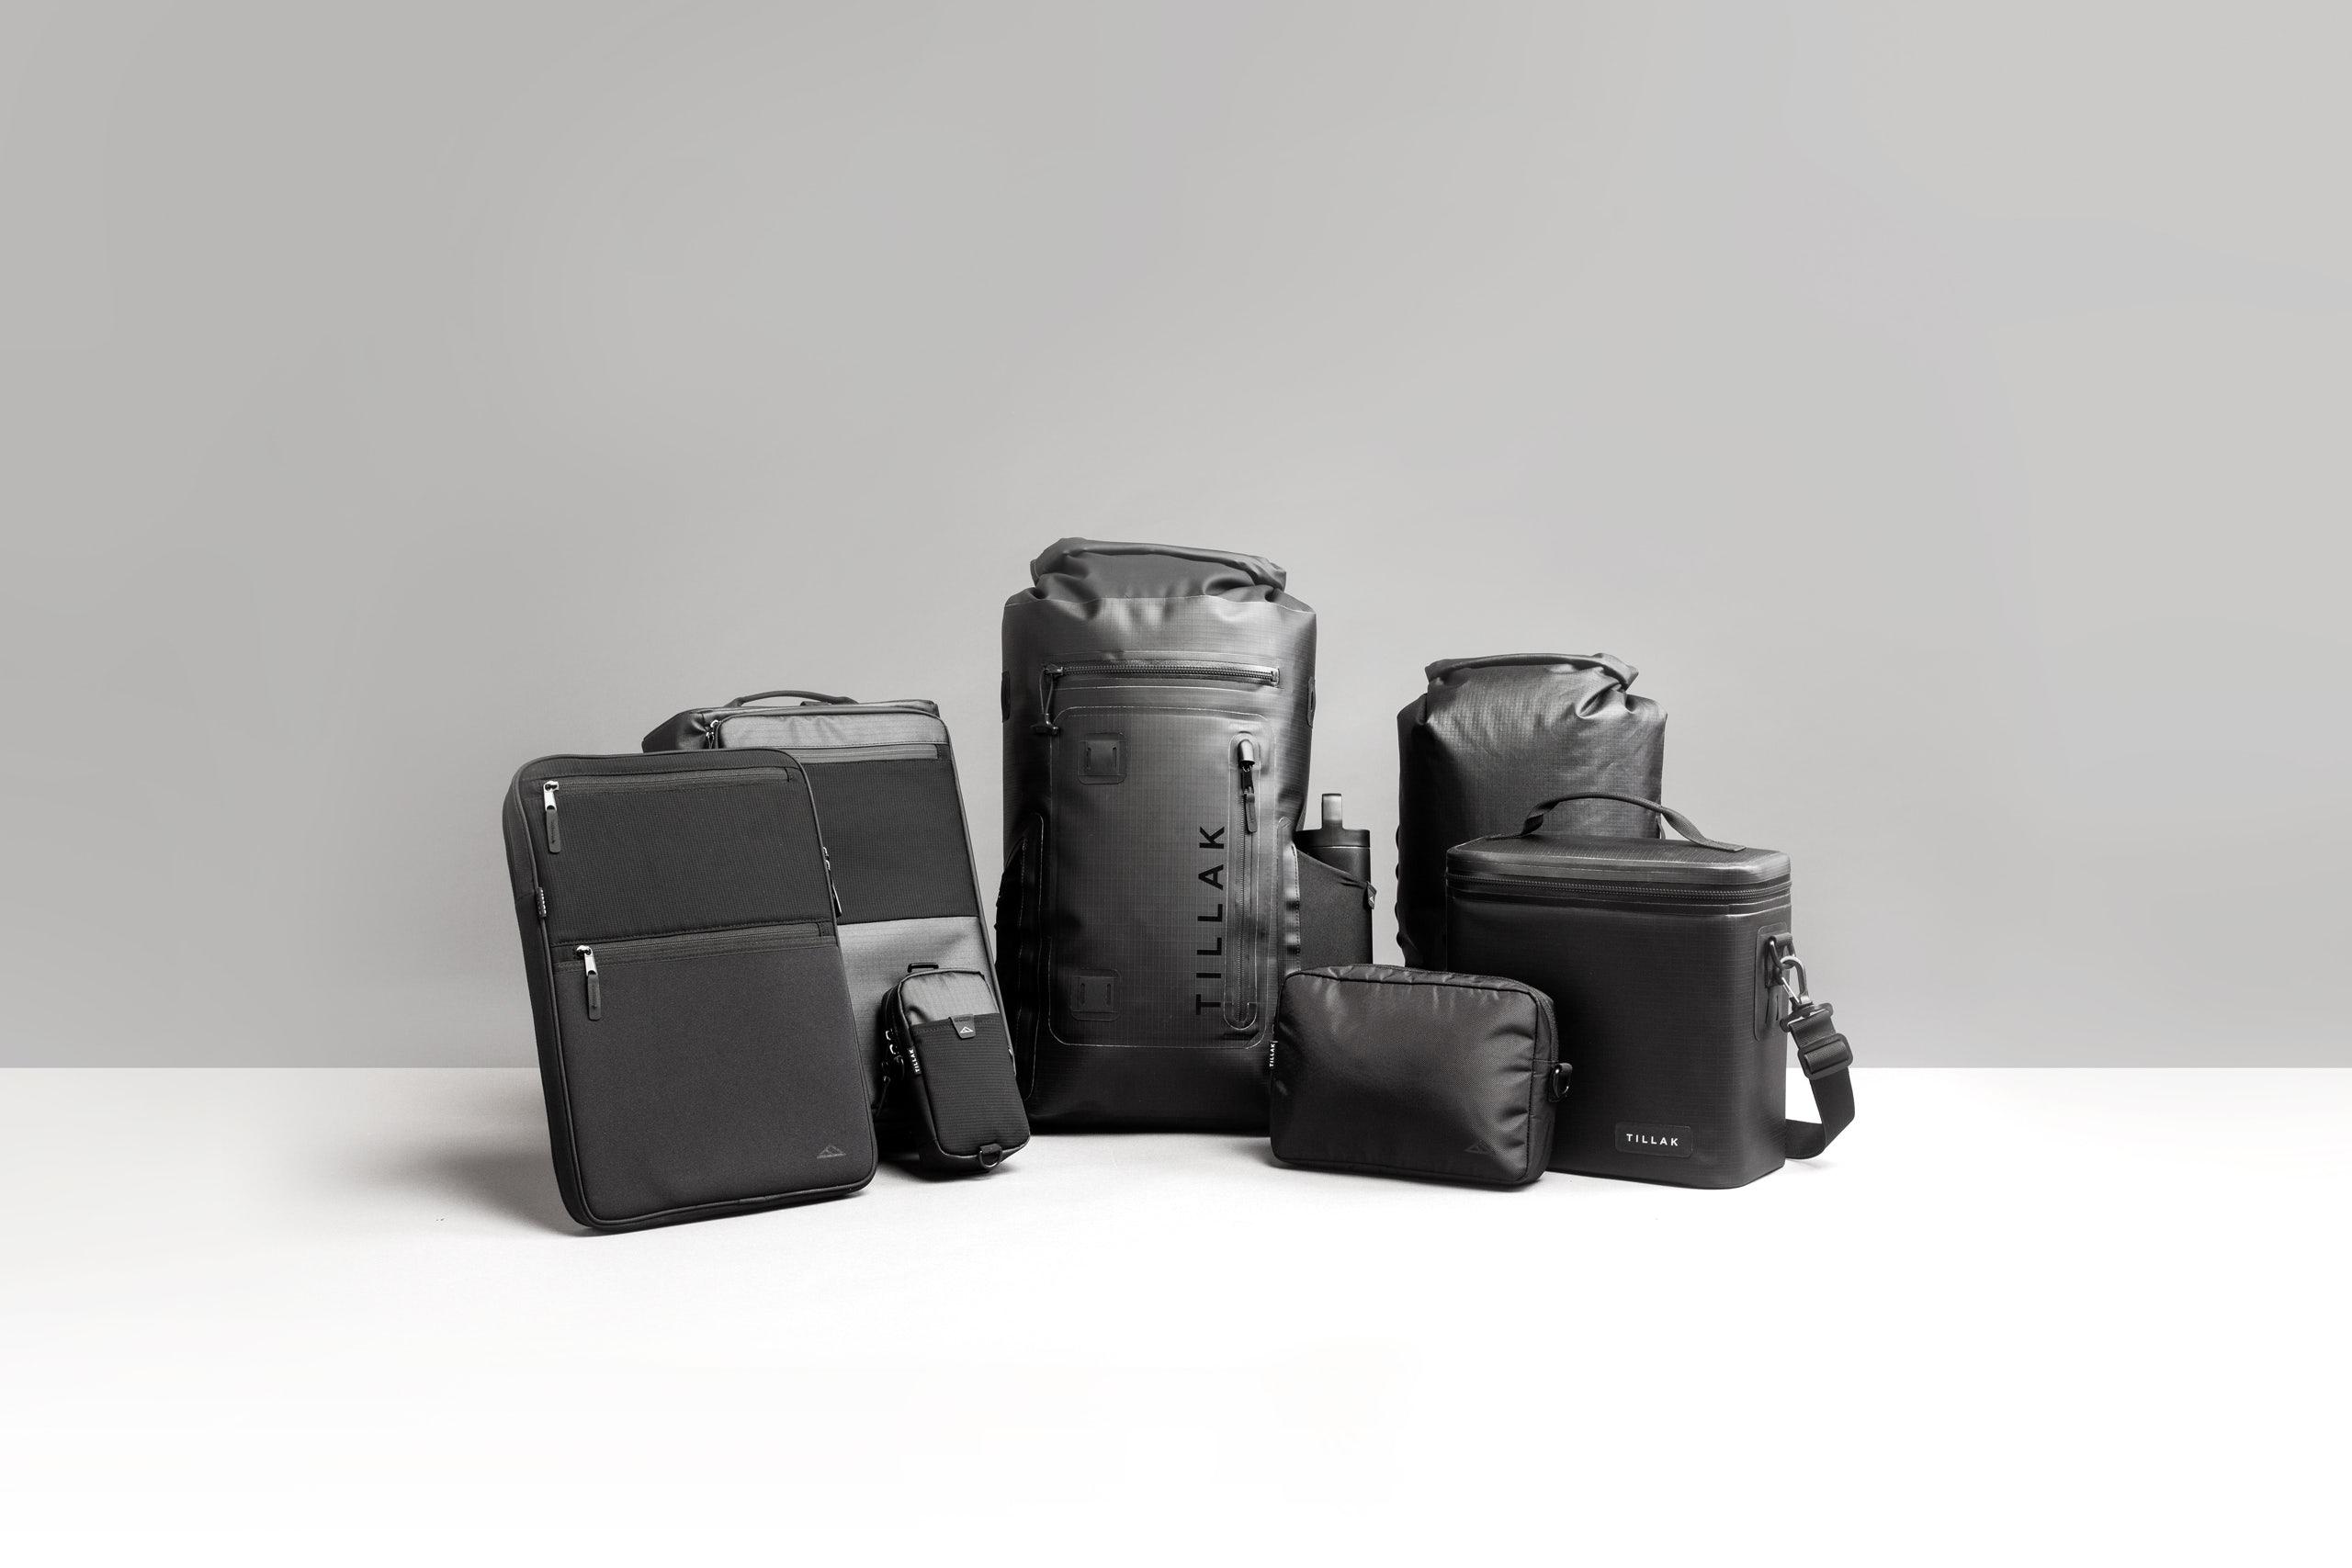 The Siletz Modular Carry System